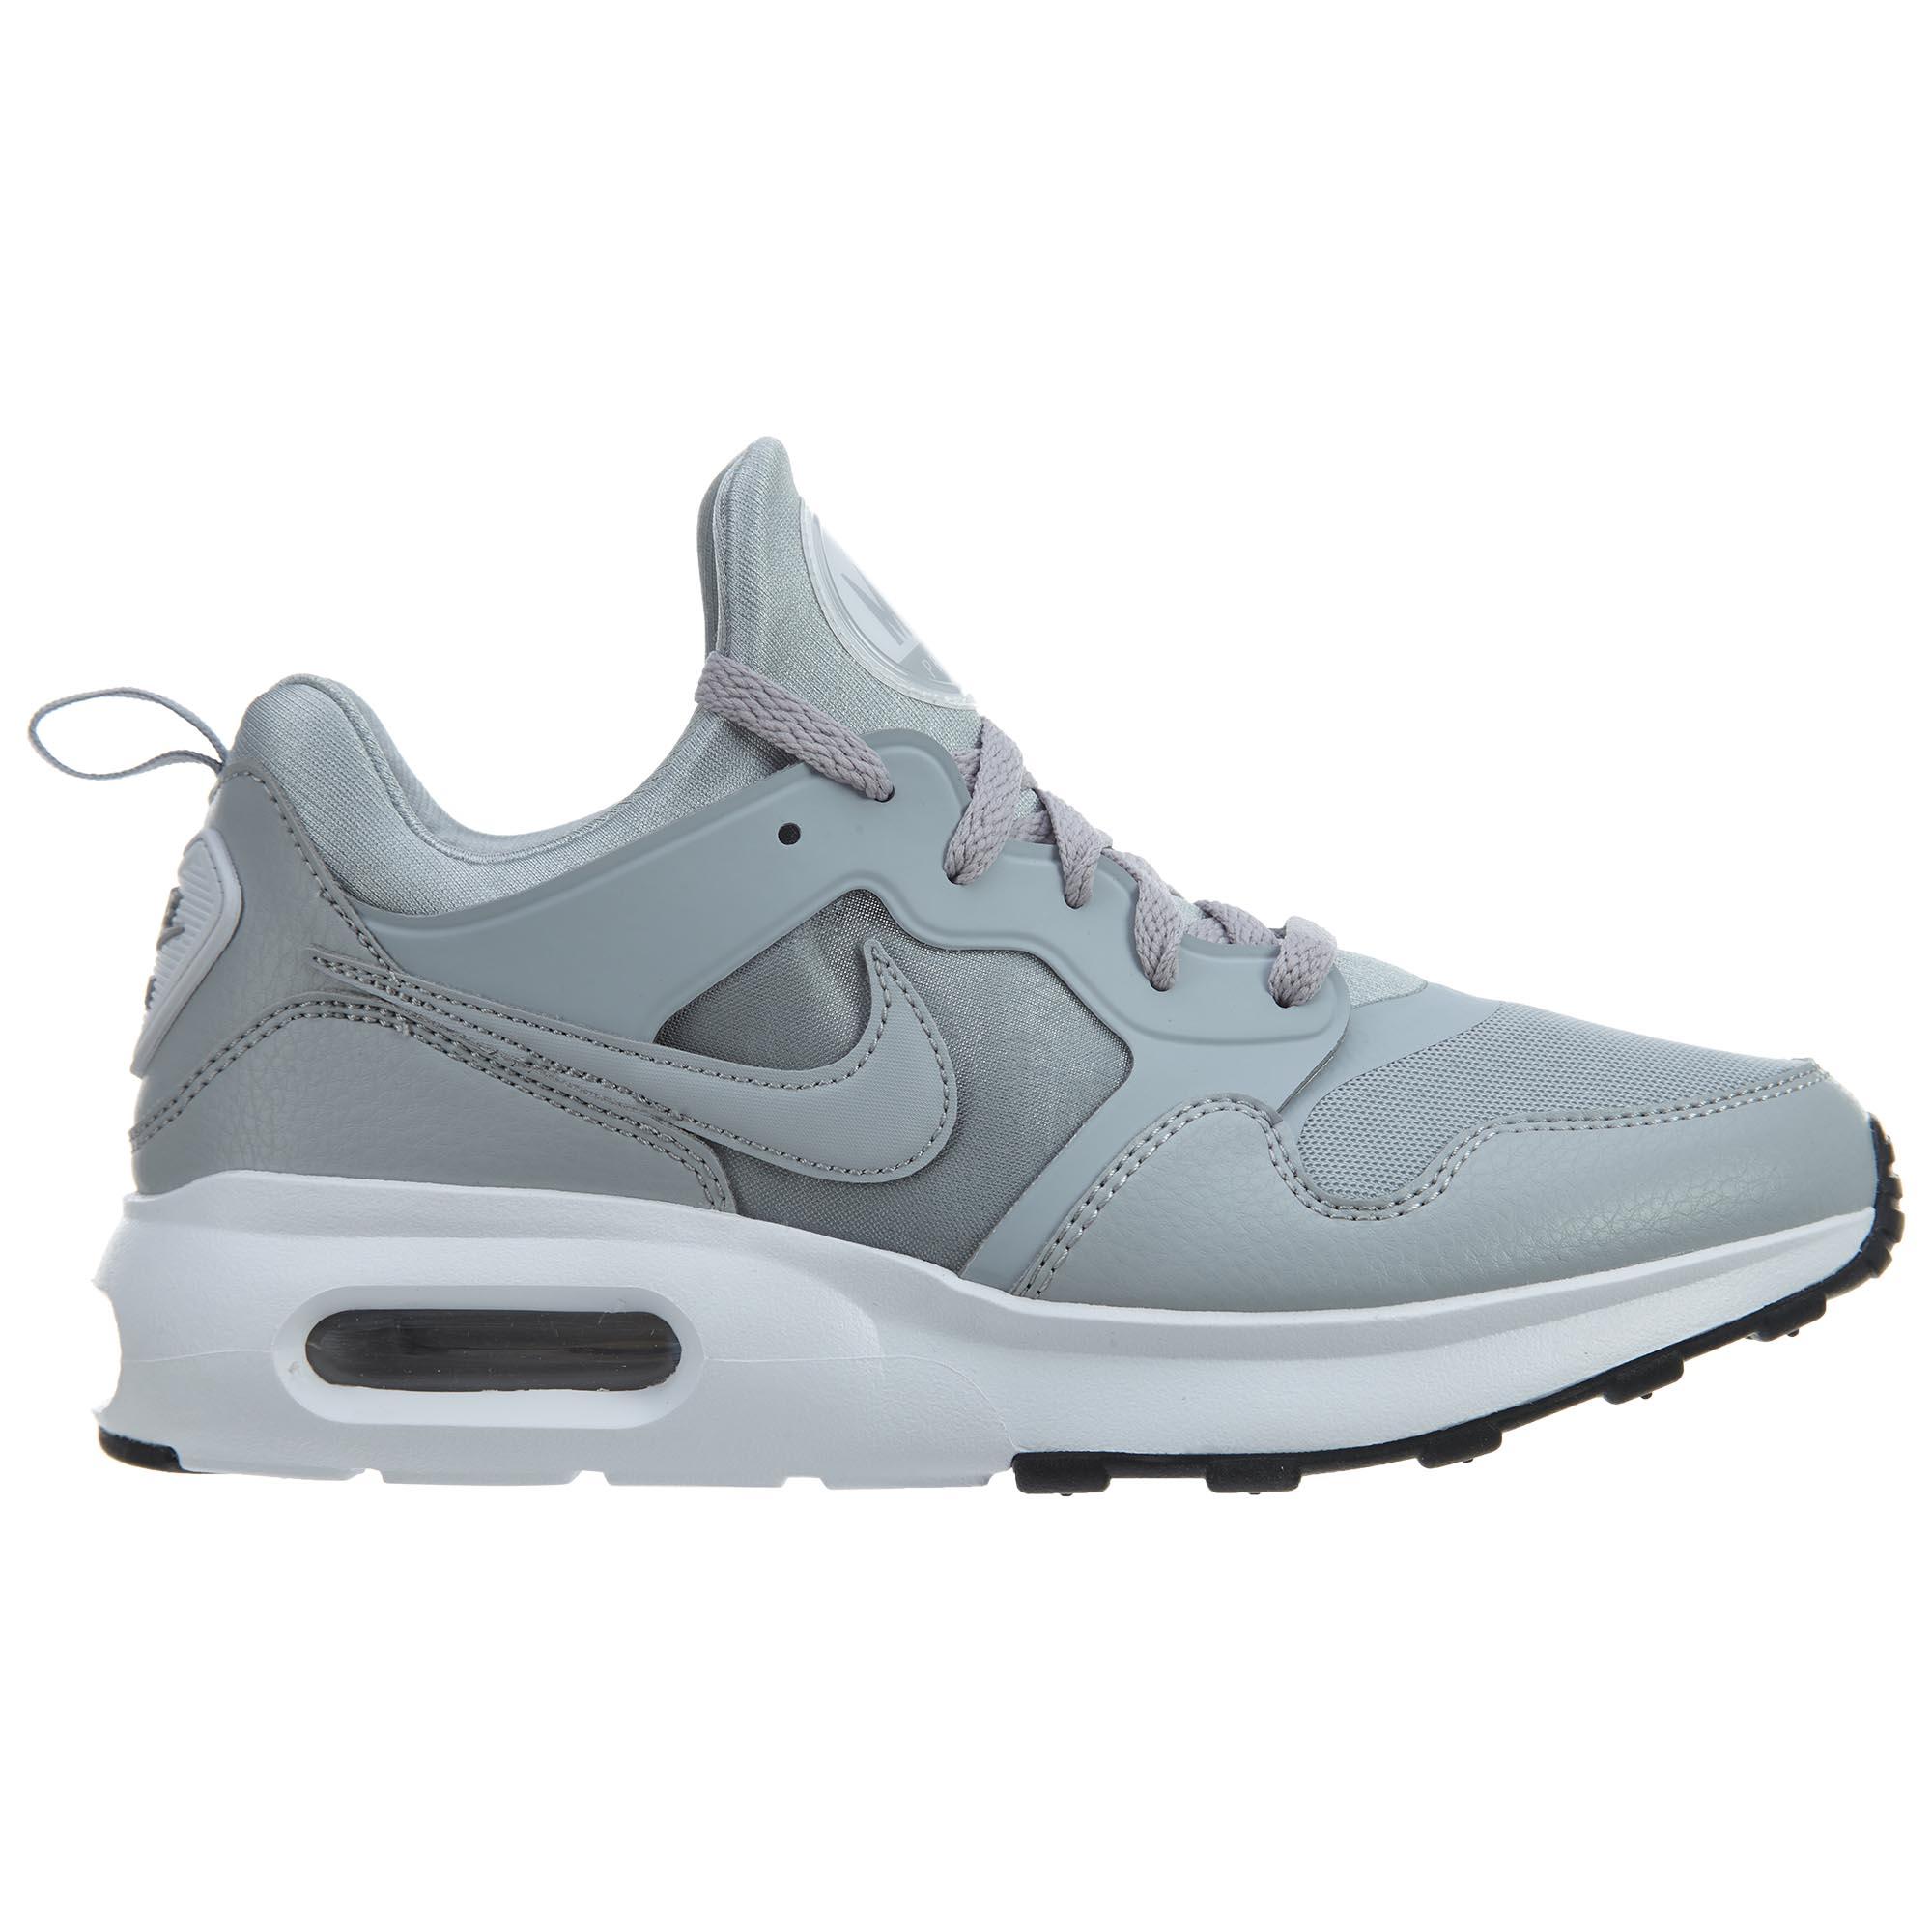 Nike Air Max Prime Wolf Grey/Wolf Grey-White - 876068-002